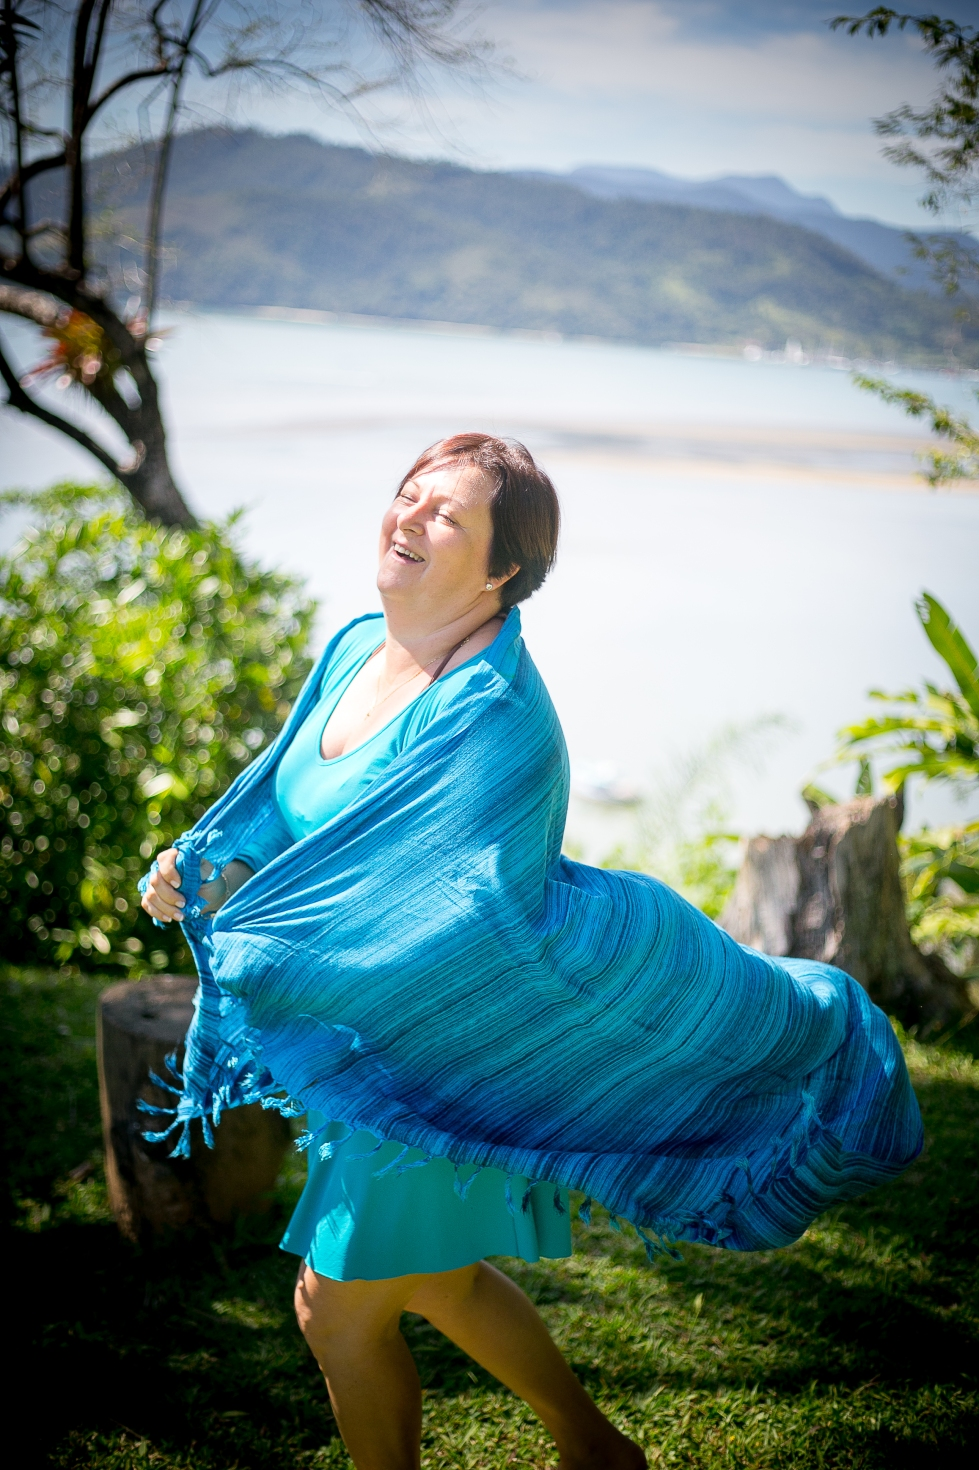 Tania Teodoro em Paraty